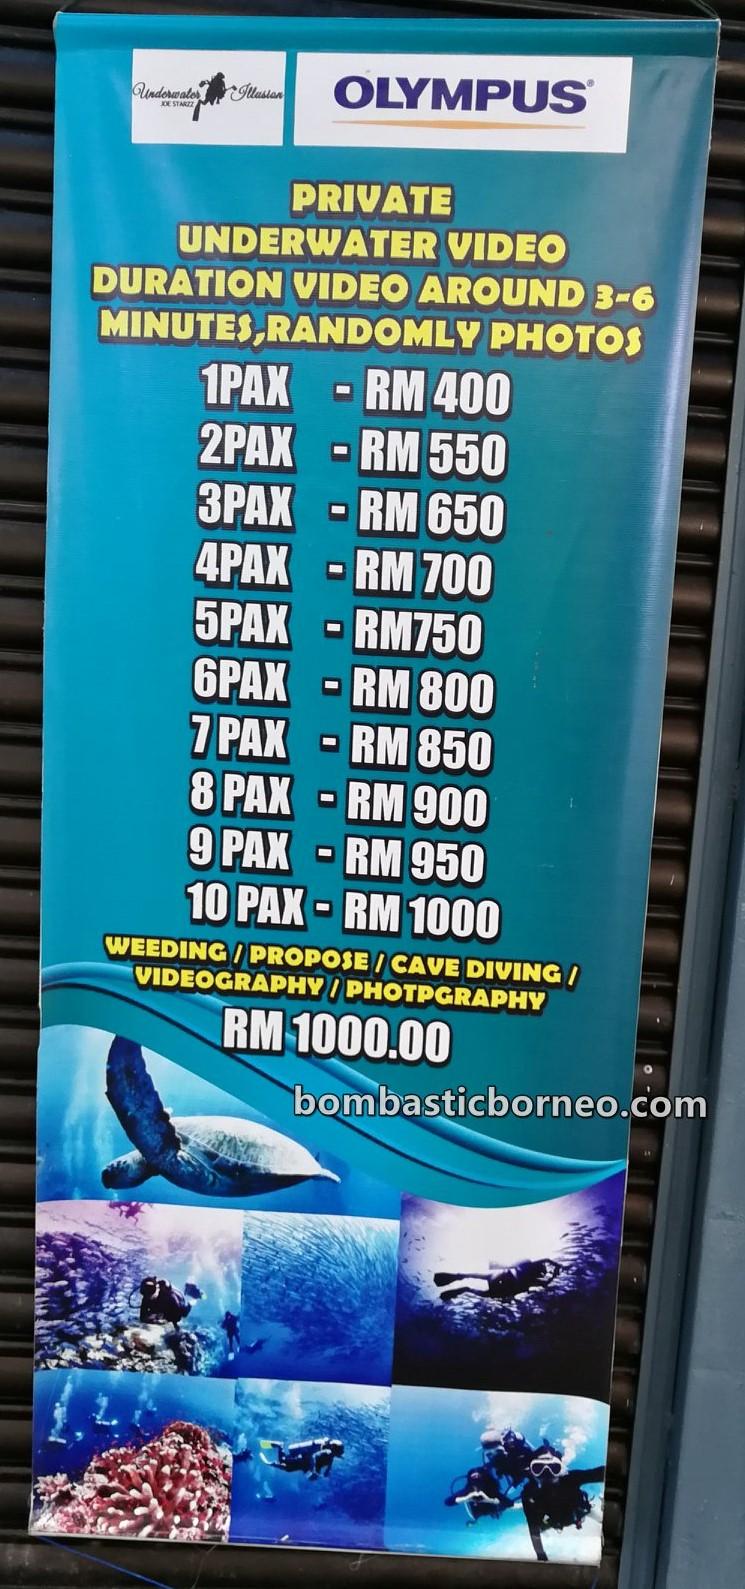 backpackers, destination, nature, island, Tawau, Tourism, tourist attraction, Borneo, 婆罗洲马来西亚, 沙巴仙本那,